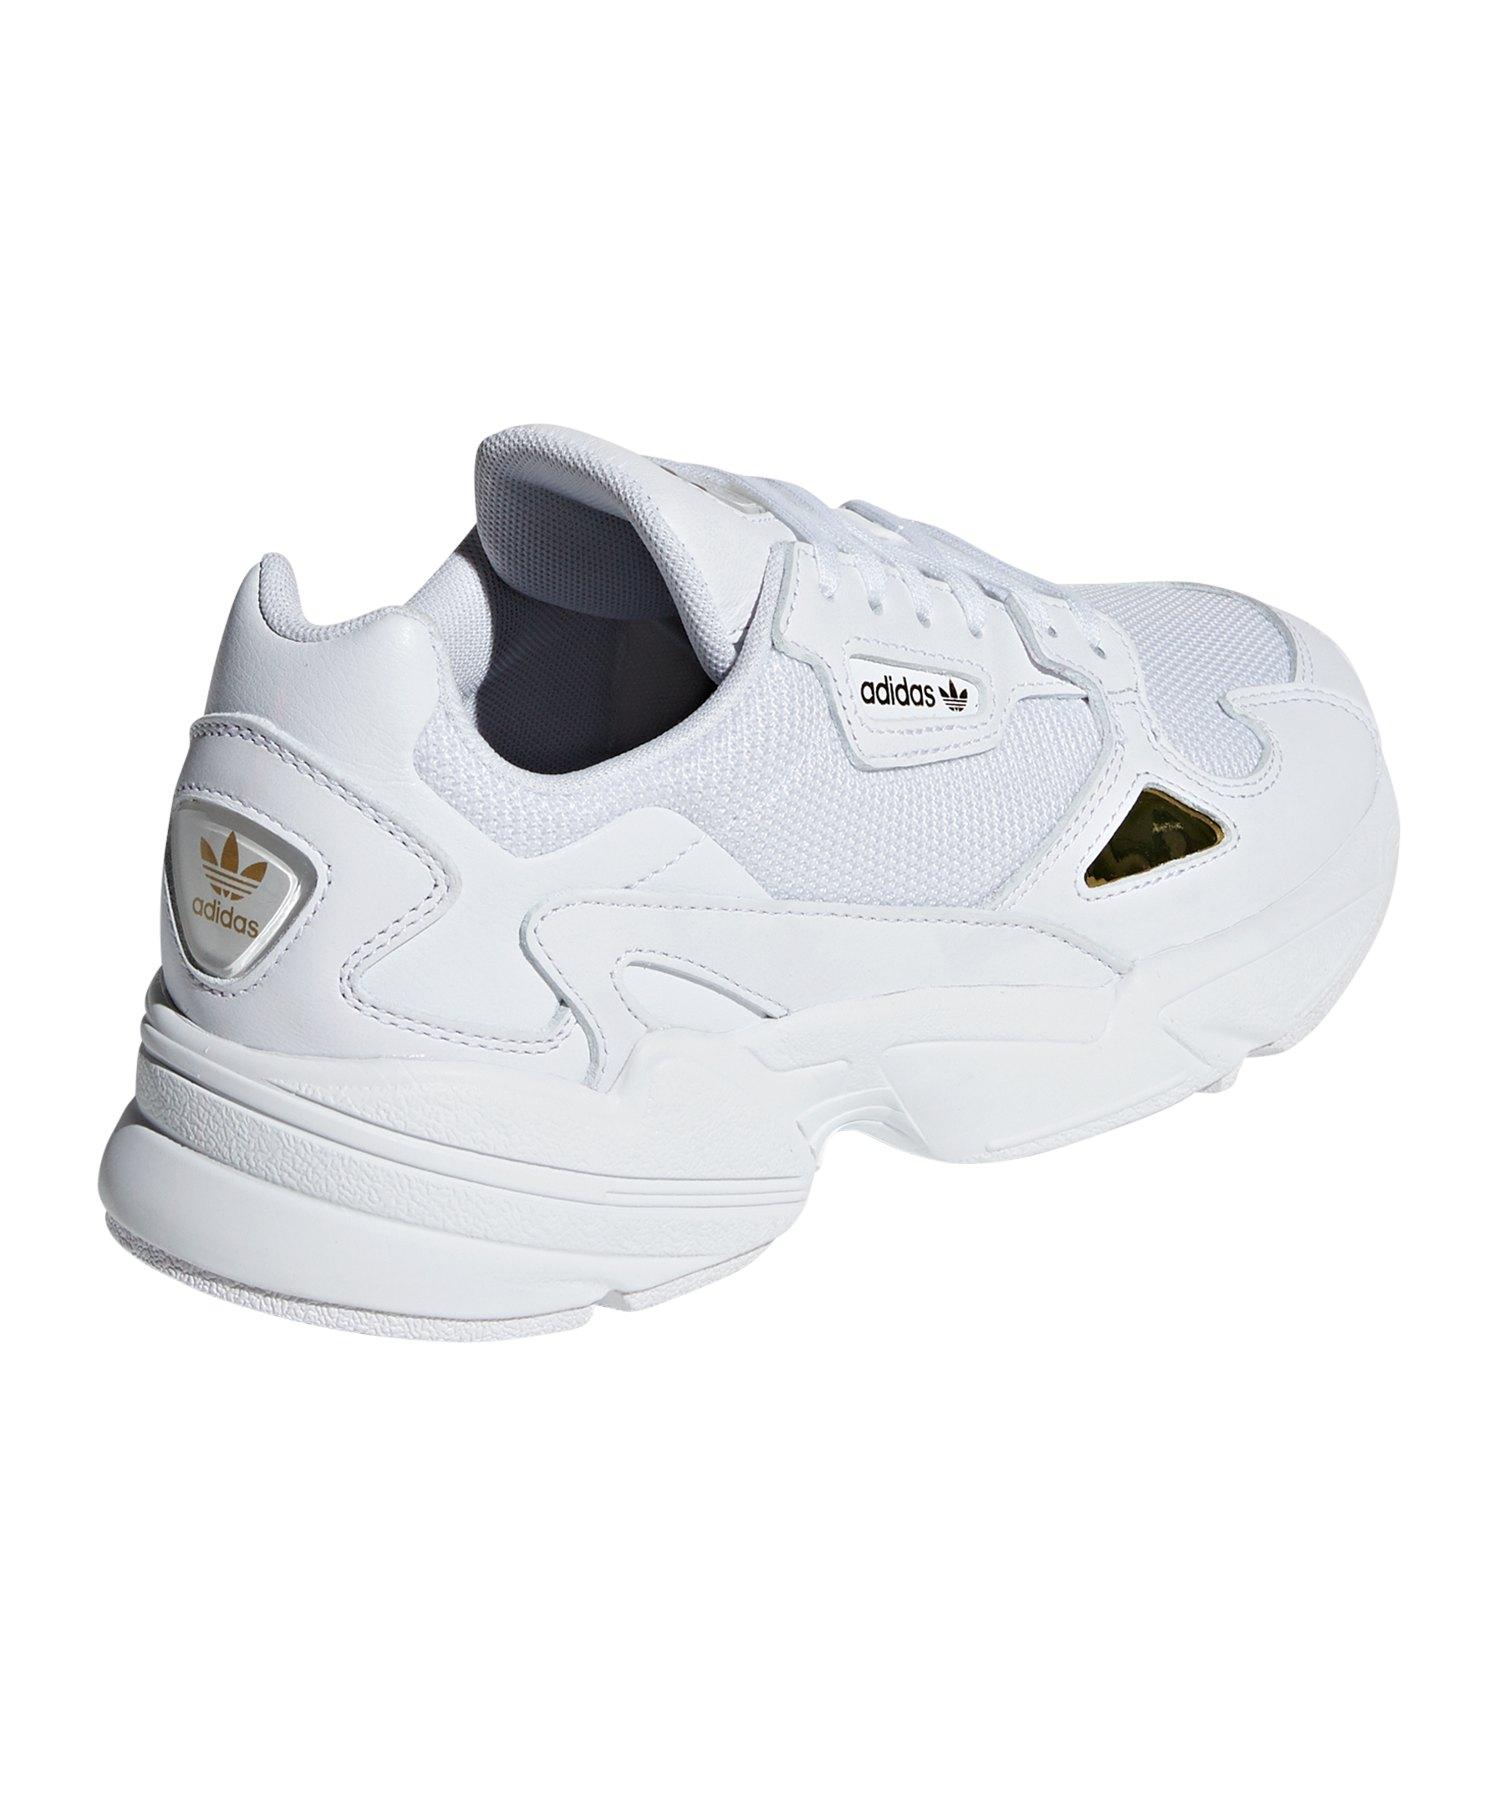 Falcon Damen Sneaker Weiss Adidas Originals wPXZlukTOi